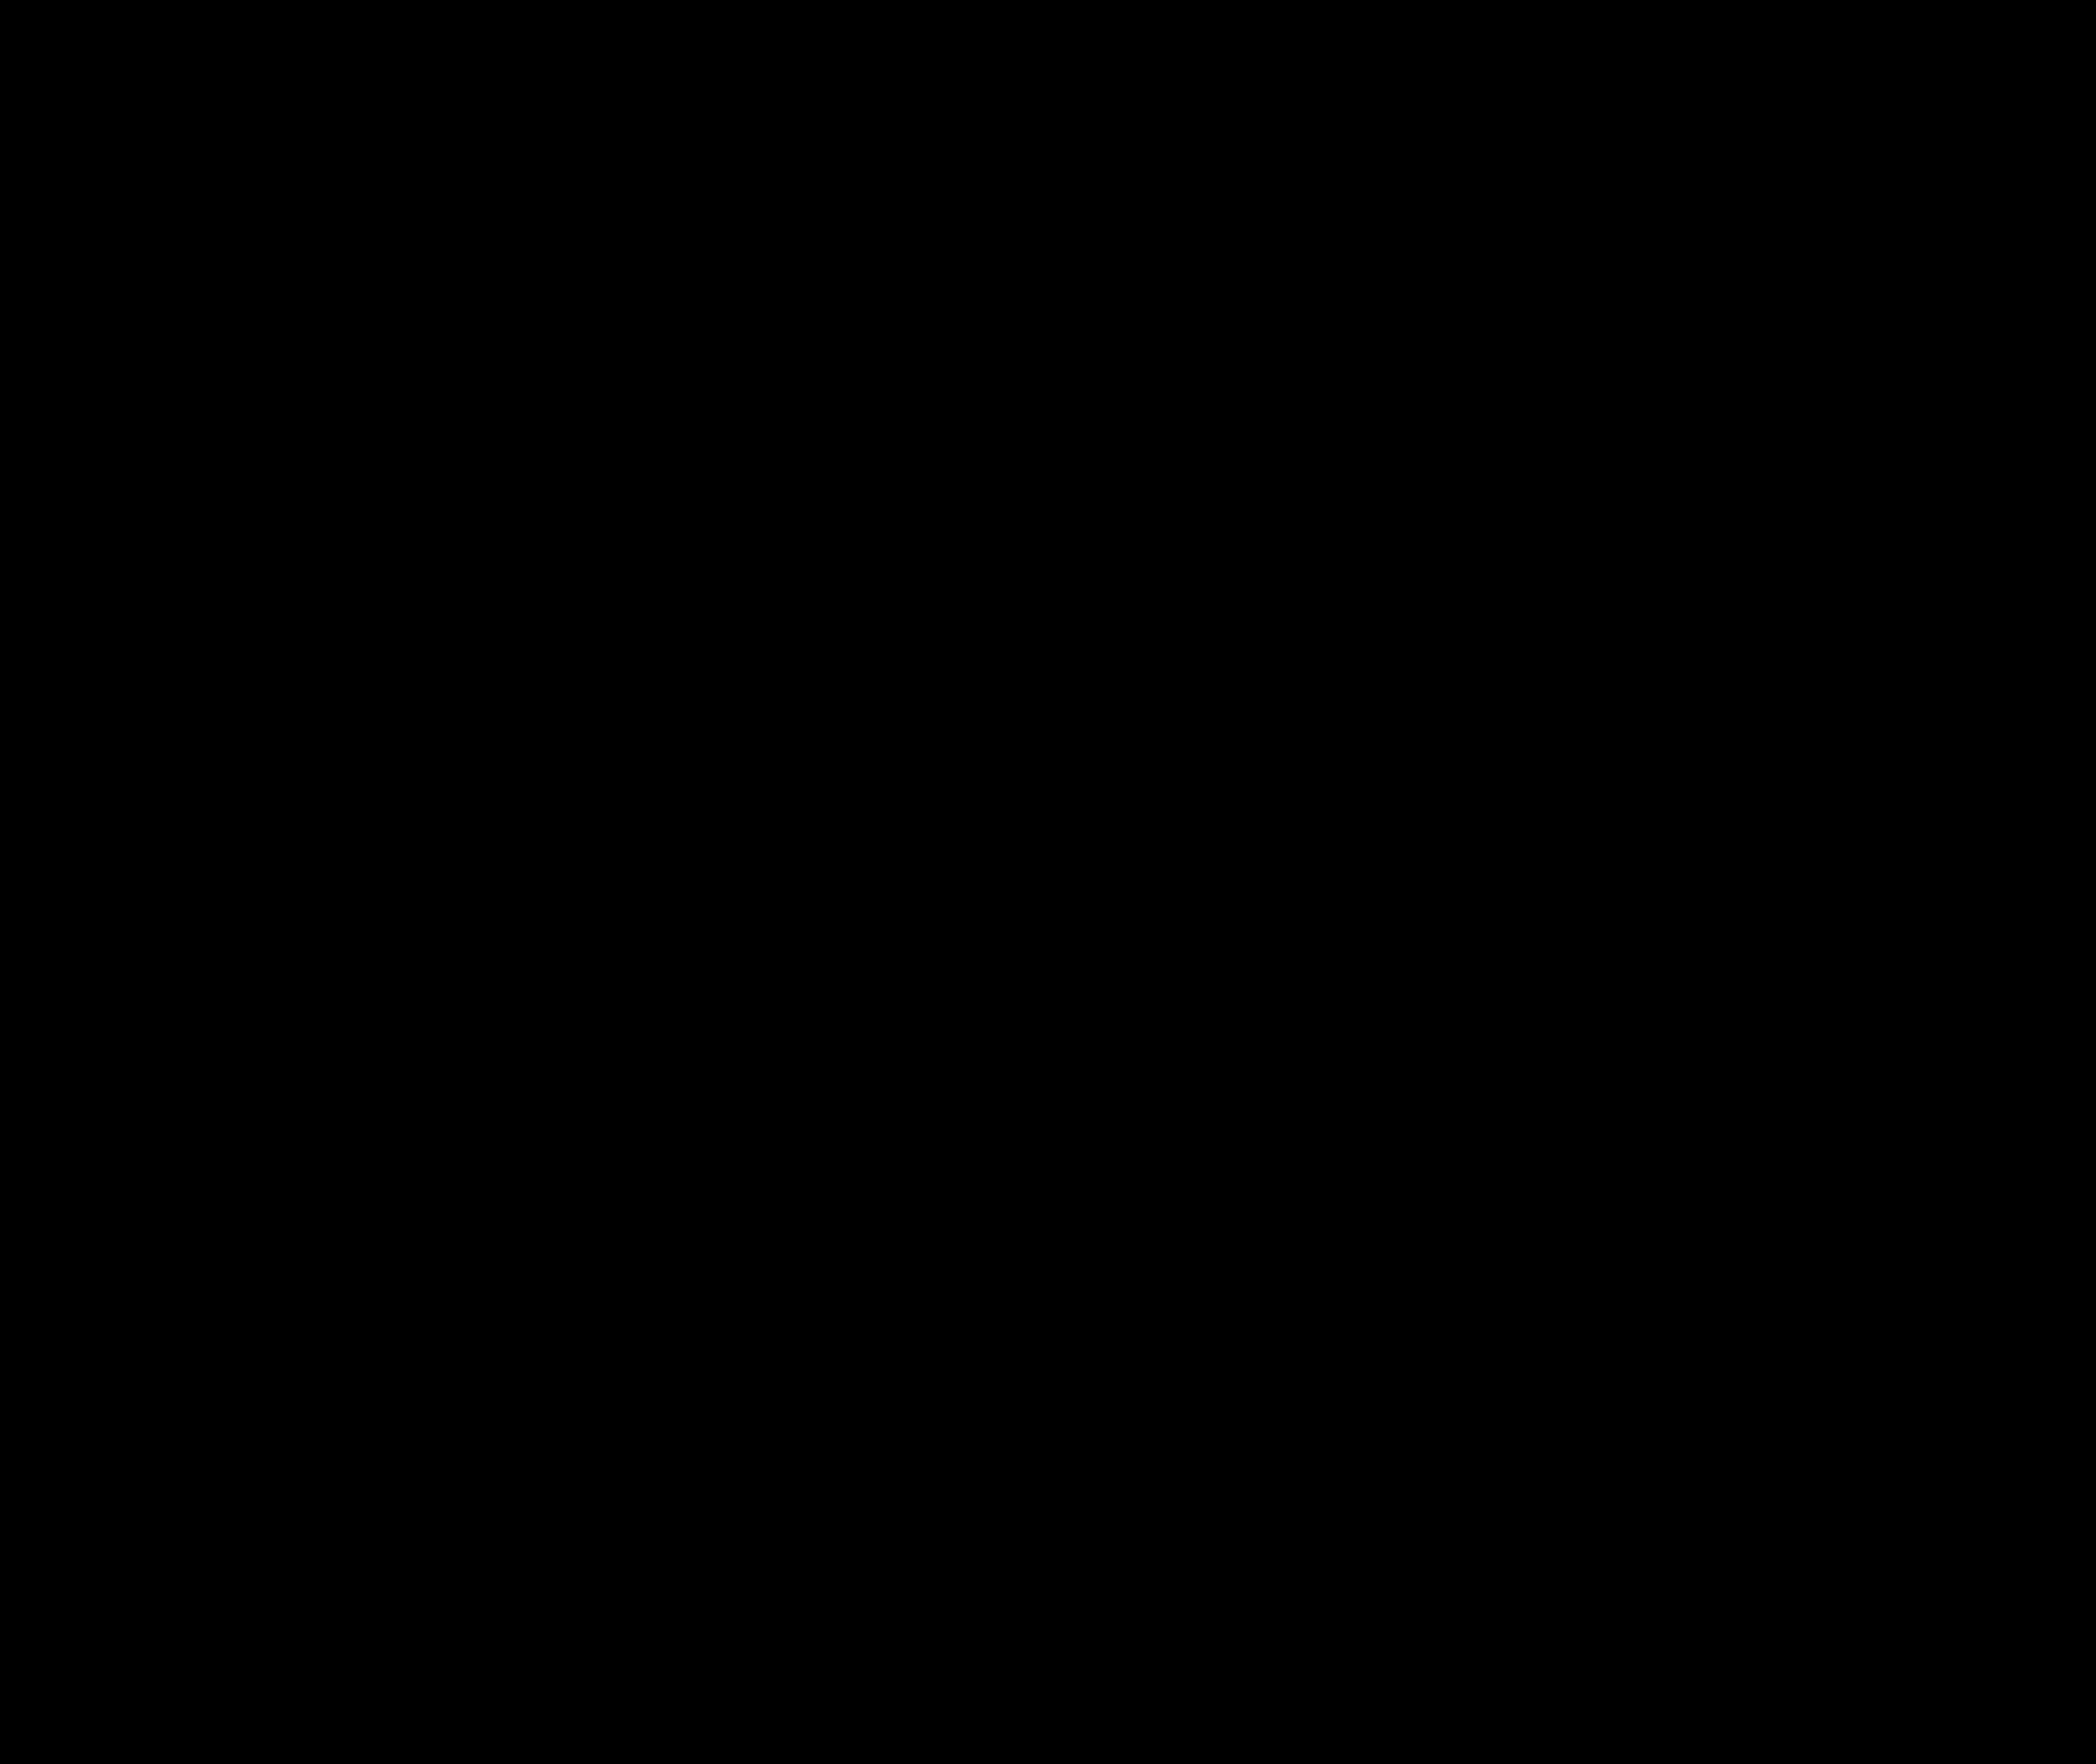 S monogram clipart black and white svg free download HD Similar Split Letter S Black And White Cliparts - Split ... svg free download